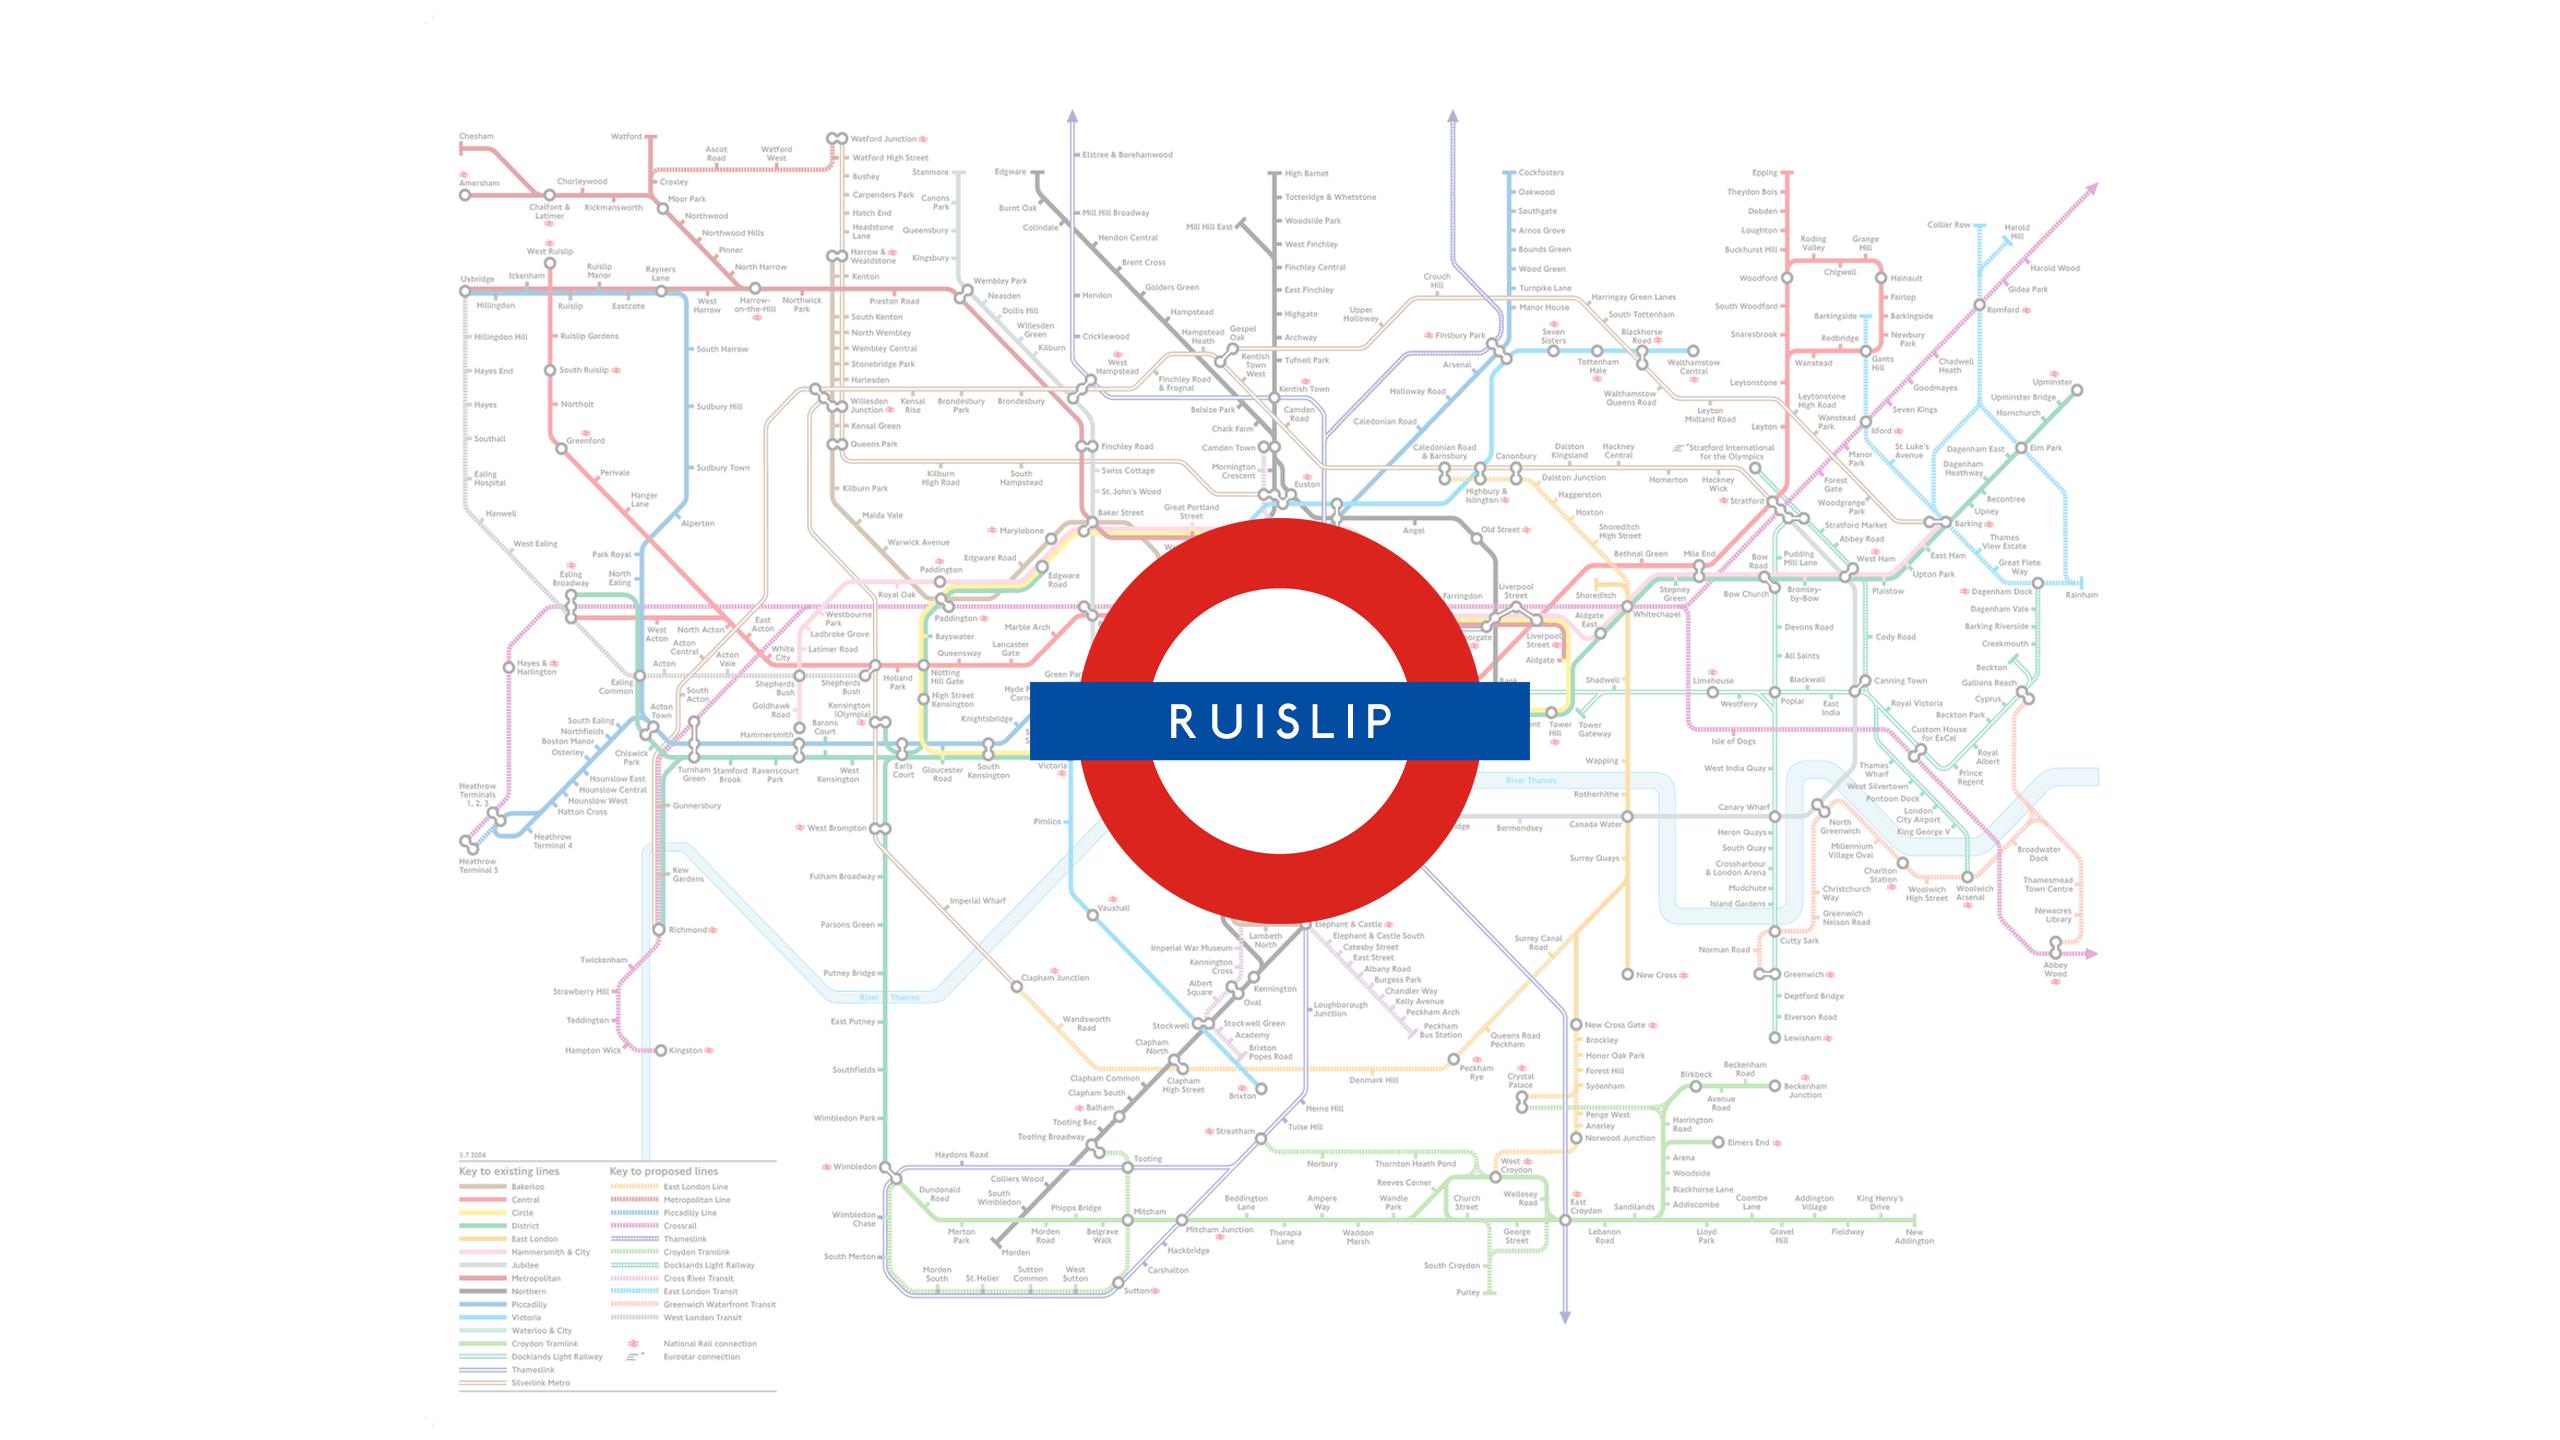 Ruislip (Map)